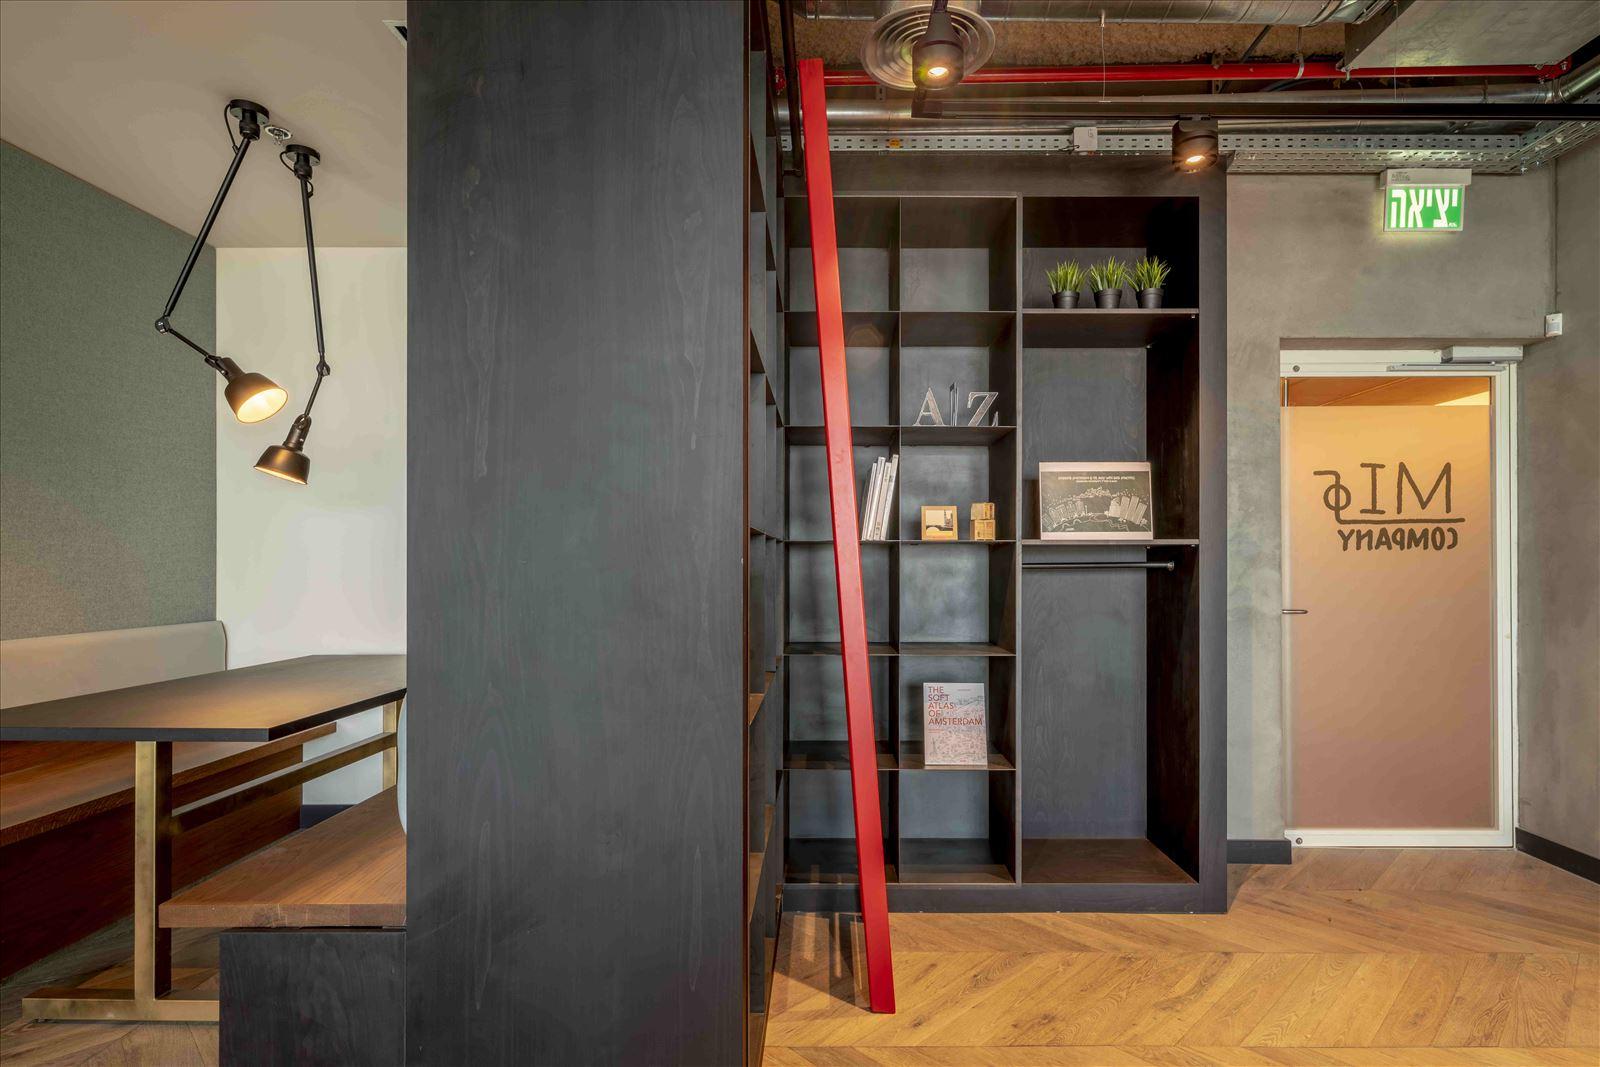 Office project תאורה במשרדים על ידי דורי קמחי